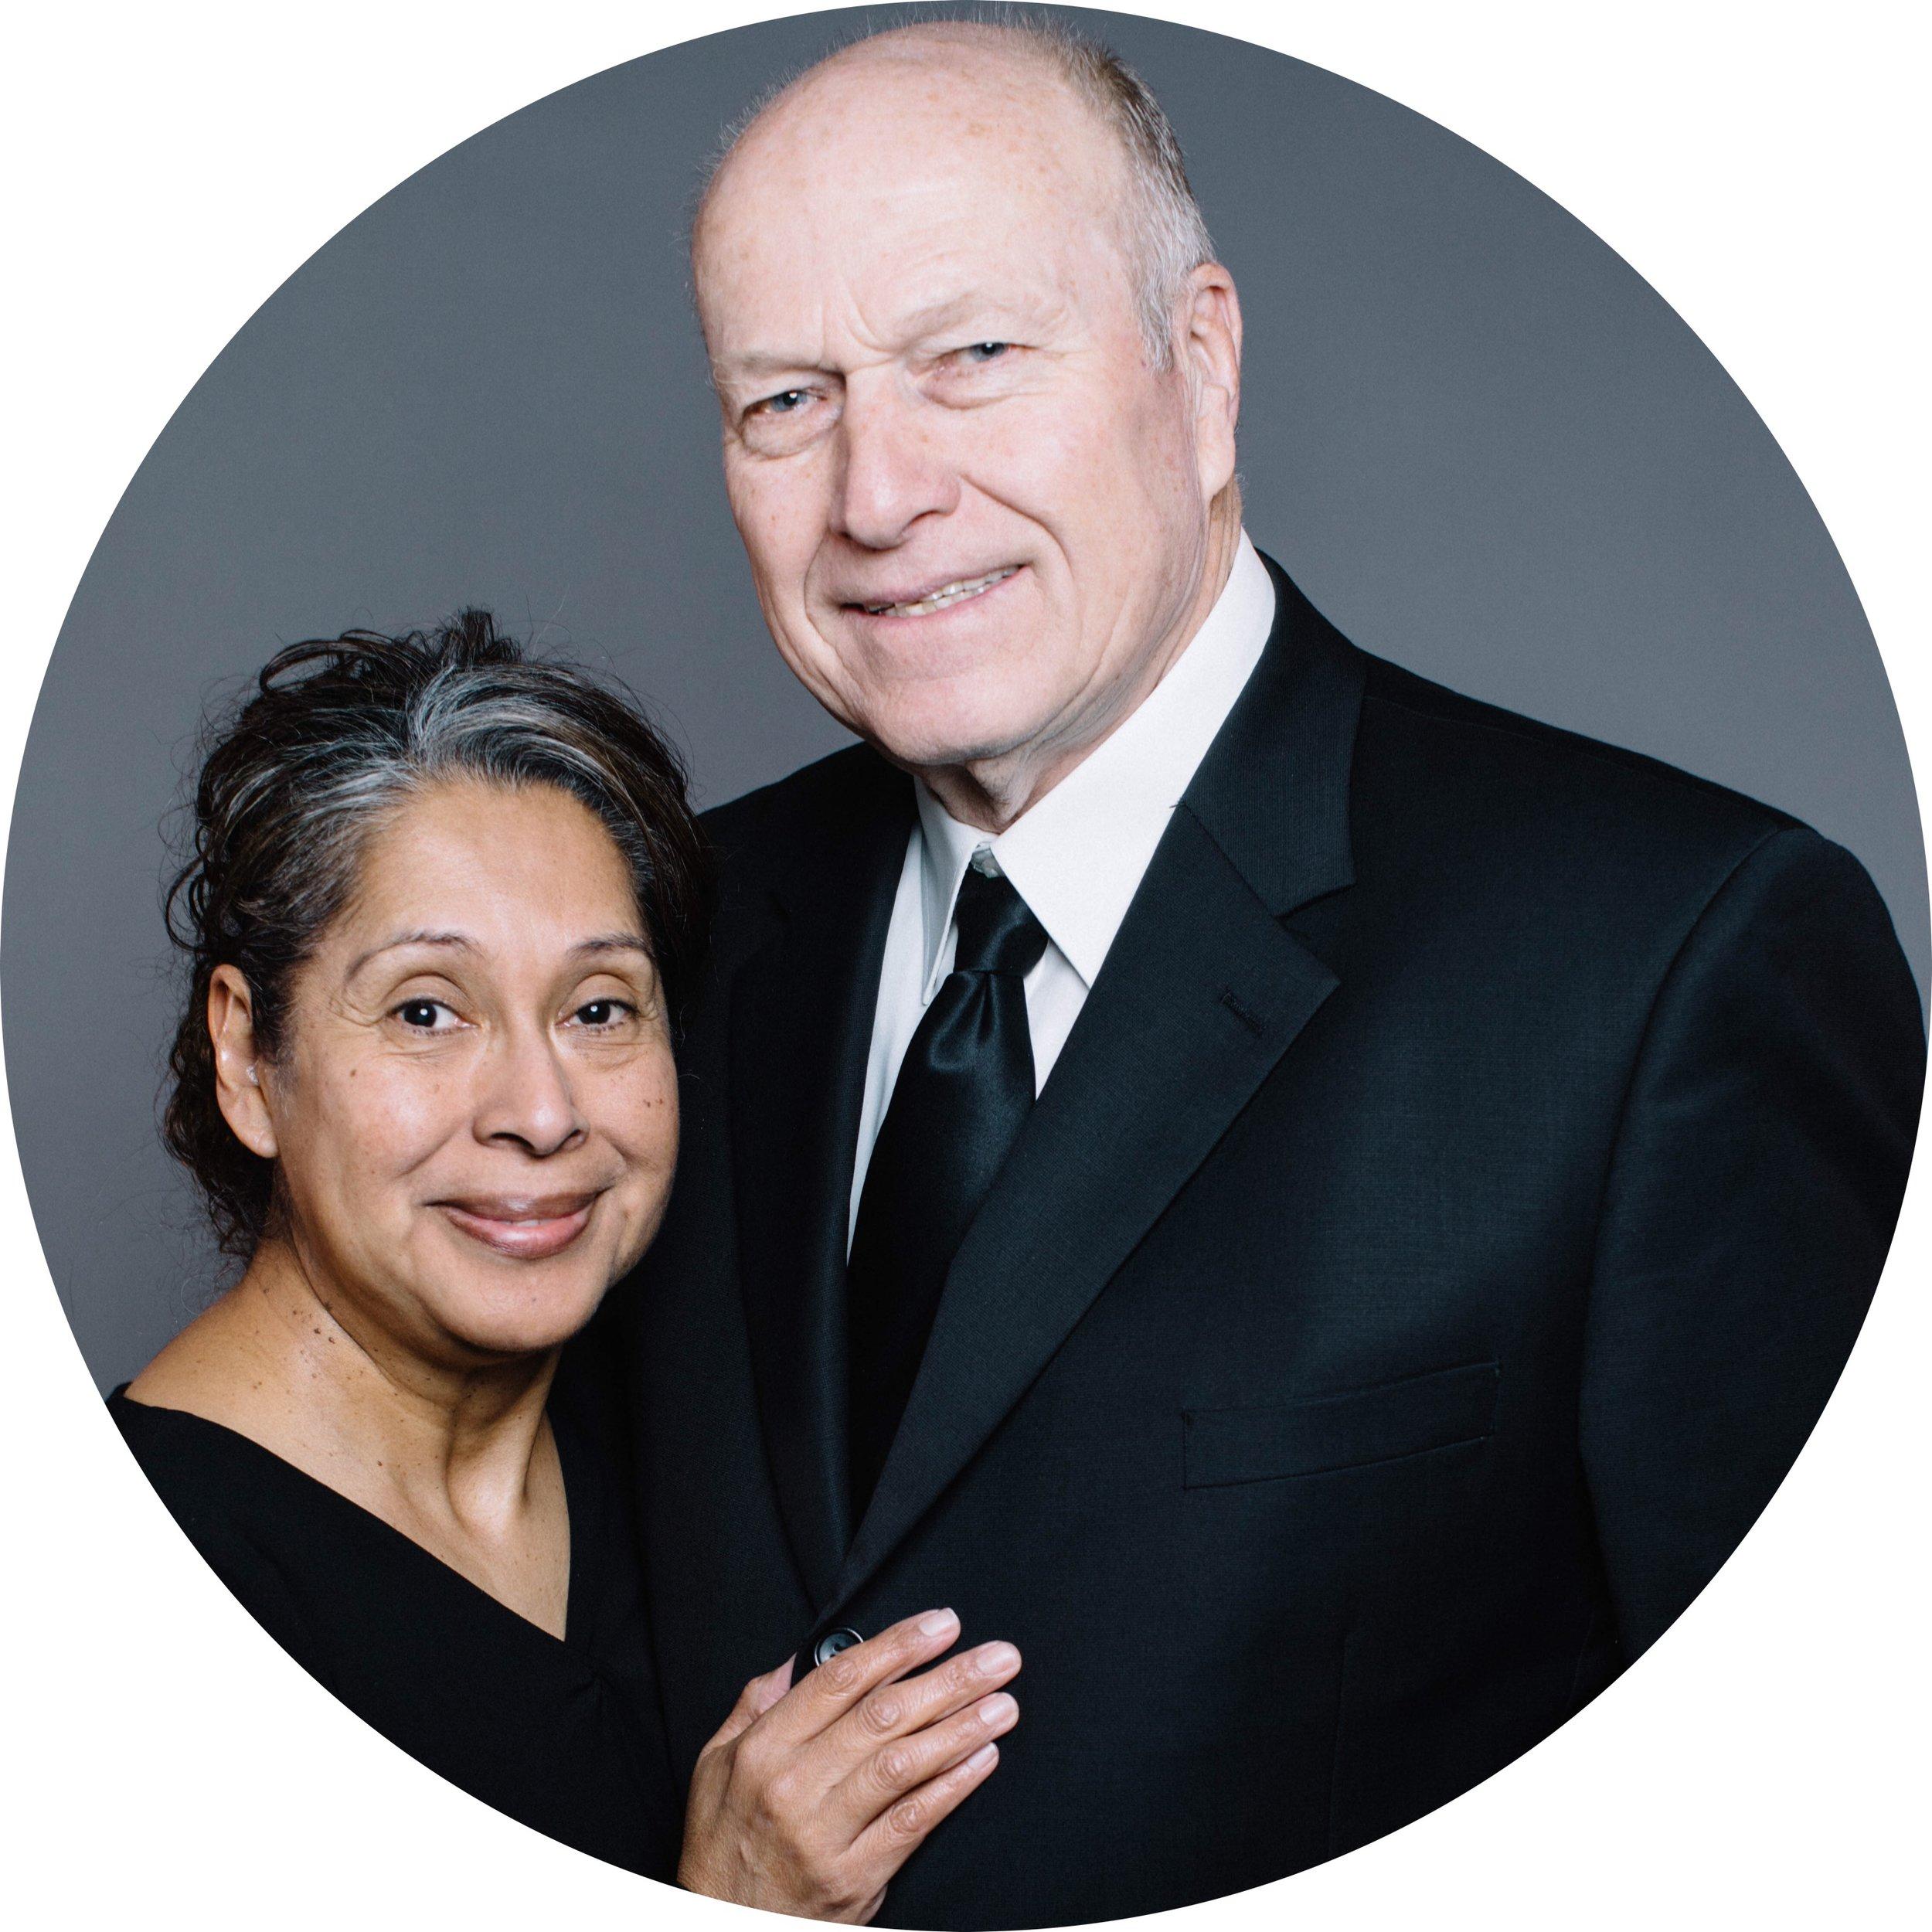 Director de GRUPOS HOGARENOS - Larry & Ruthie Cochran